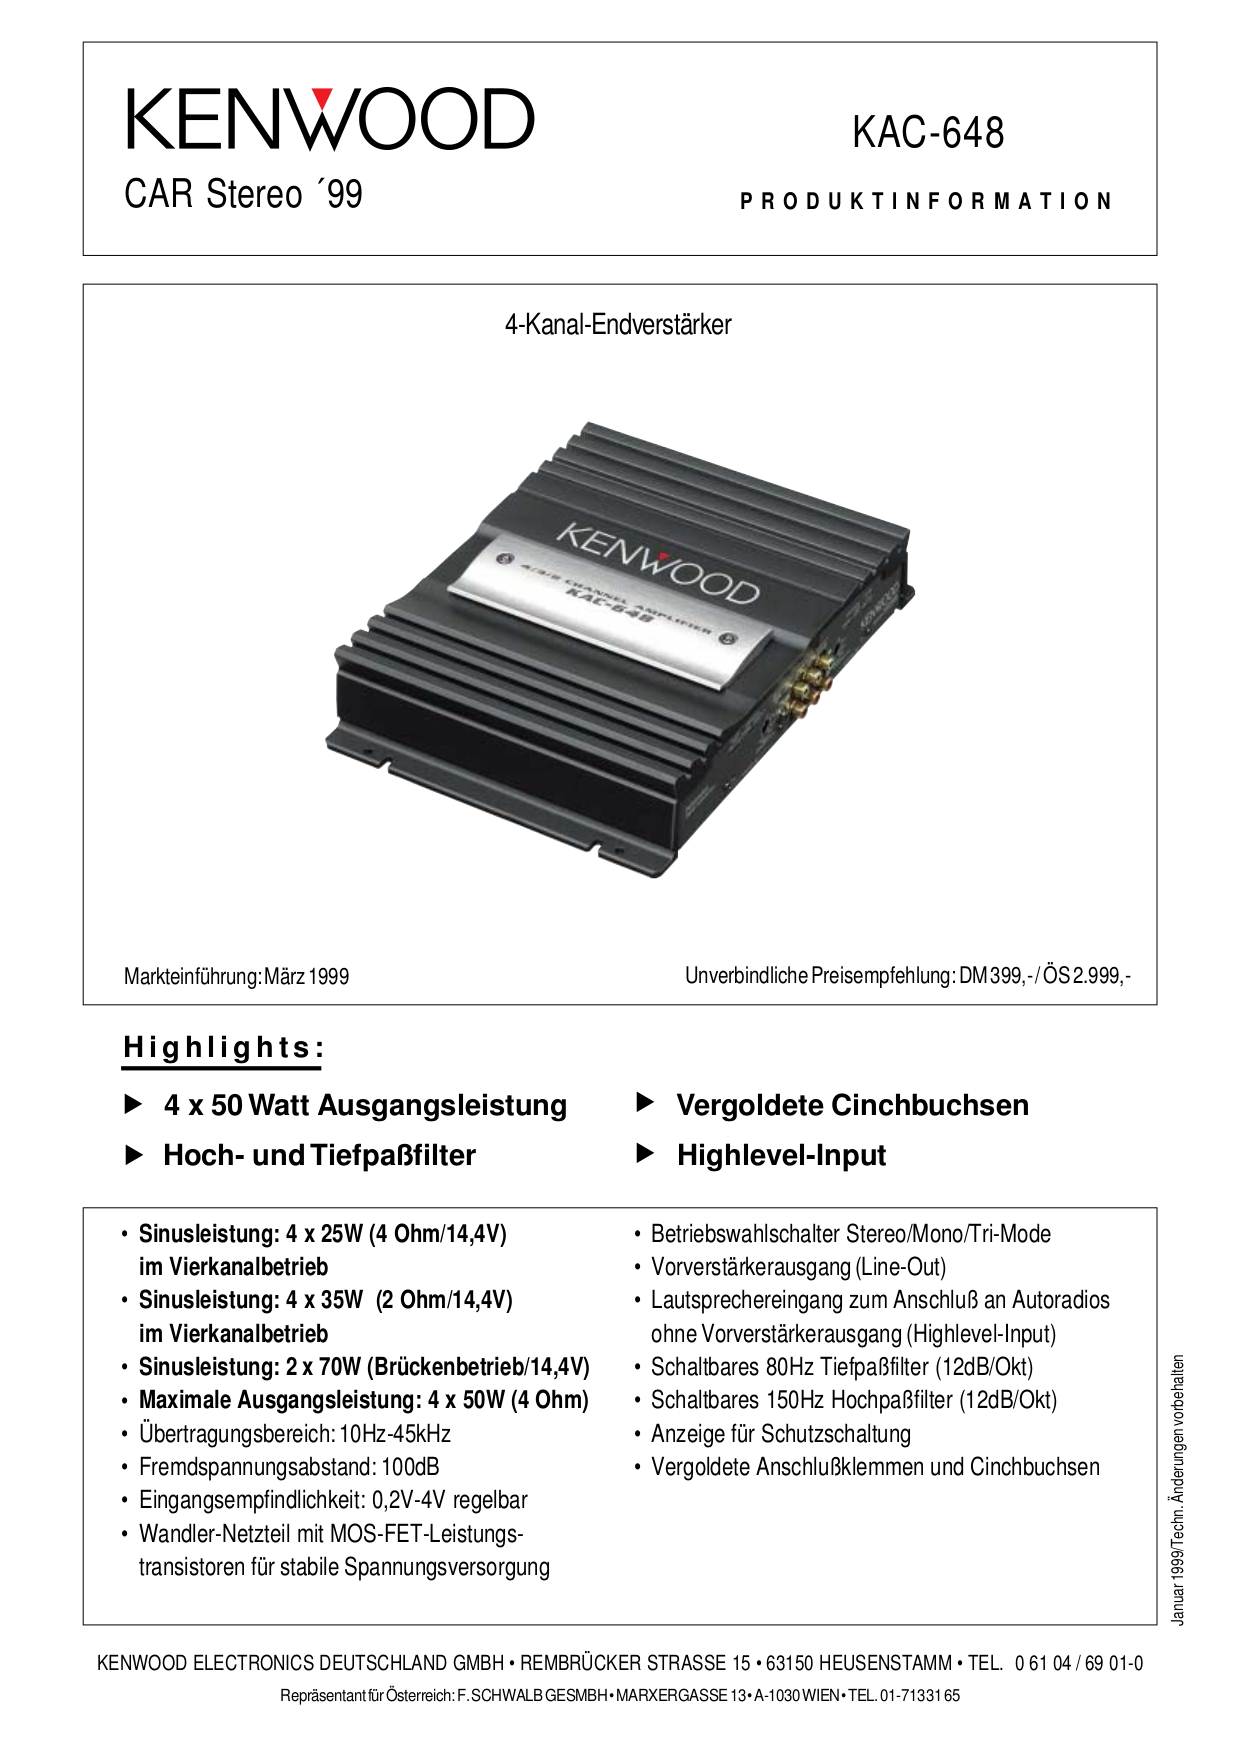 Wiring Diagram Kenwood Amplifier Kac 648 Data Ddx7015 Download Free Pdf For 648s Car Manual Rh Umlib Com Audio Speakers Jl 882